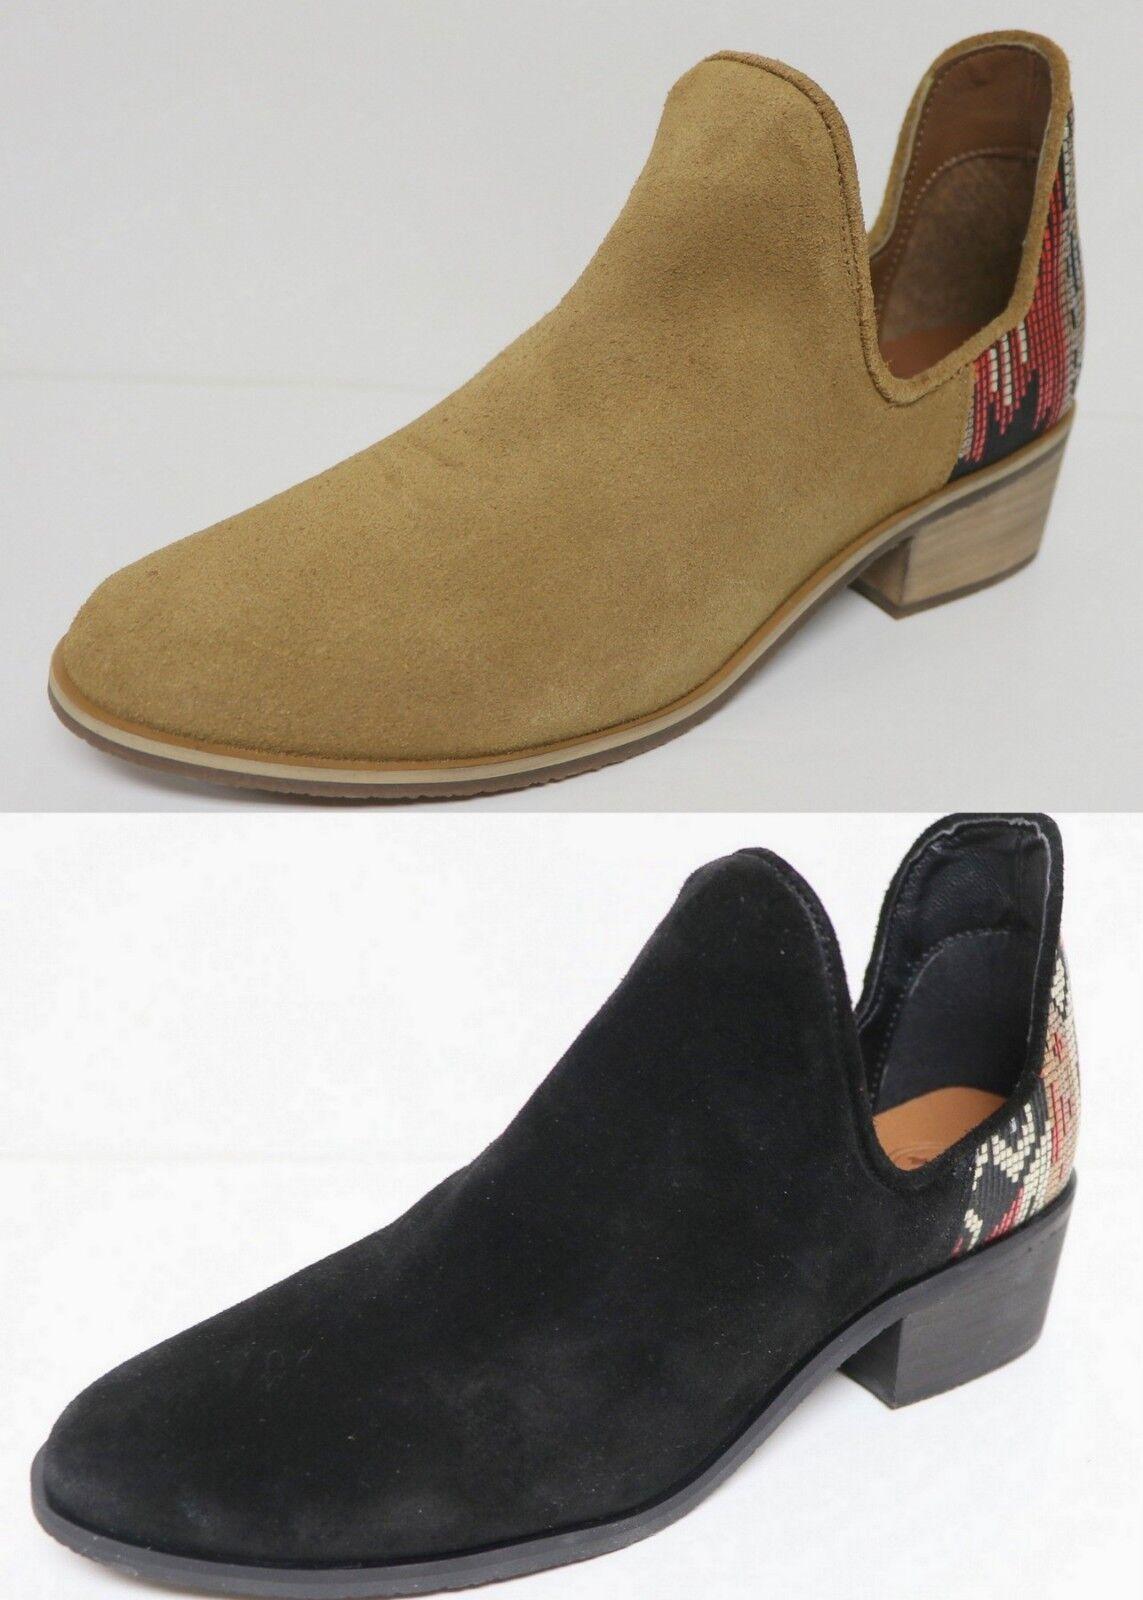 Charleston zapatos zapatos zapatos Co Aiken para Mujer Botines Mocasines shooties Azteca Bota Tobillo  comprar descuentos